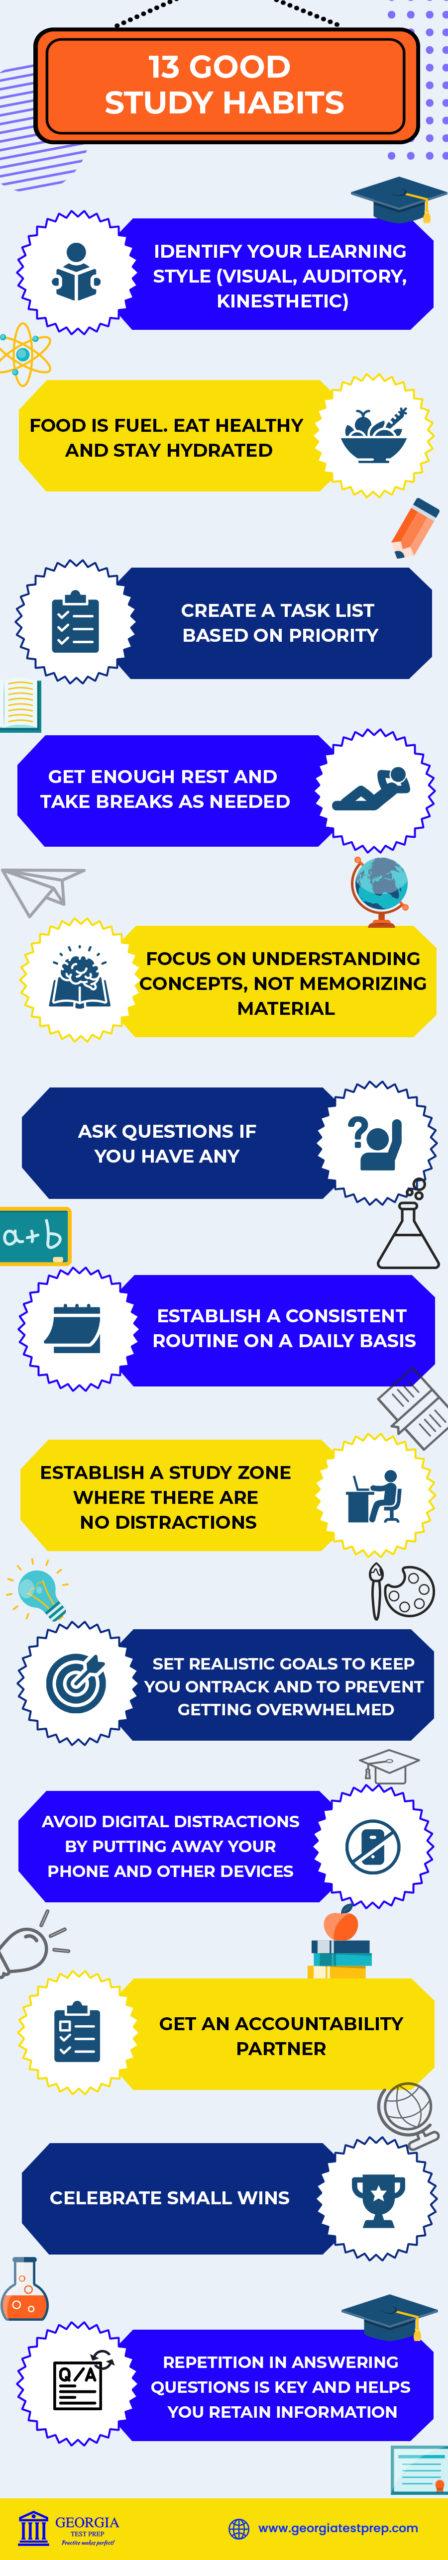 13 good study habits infographic